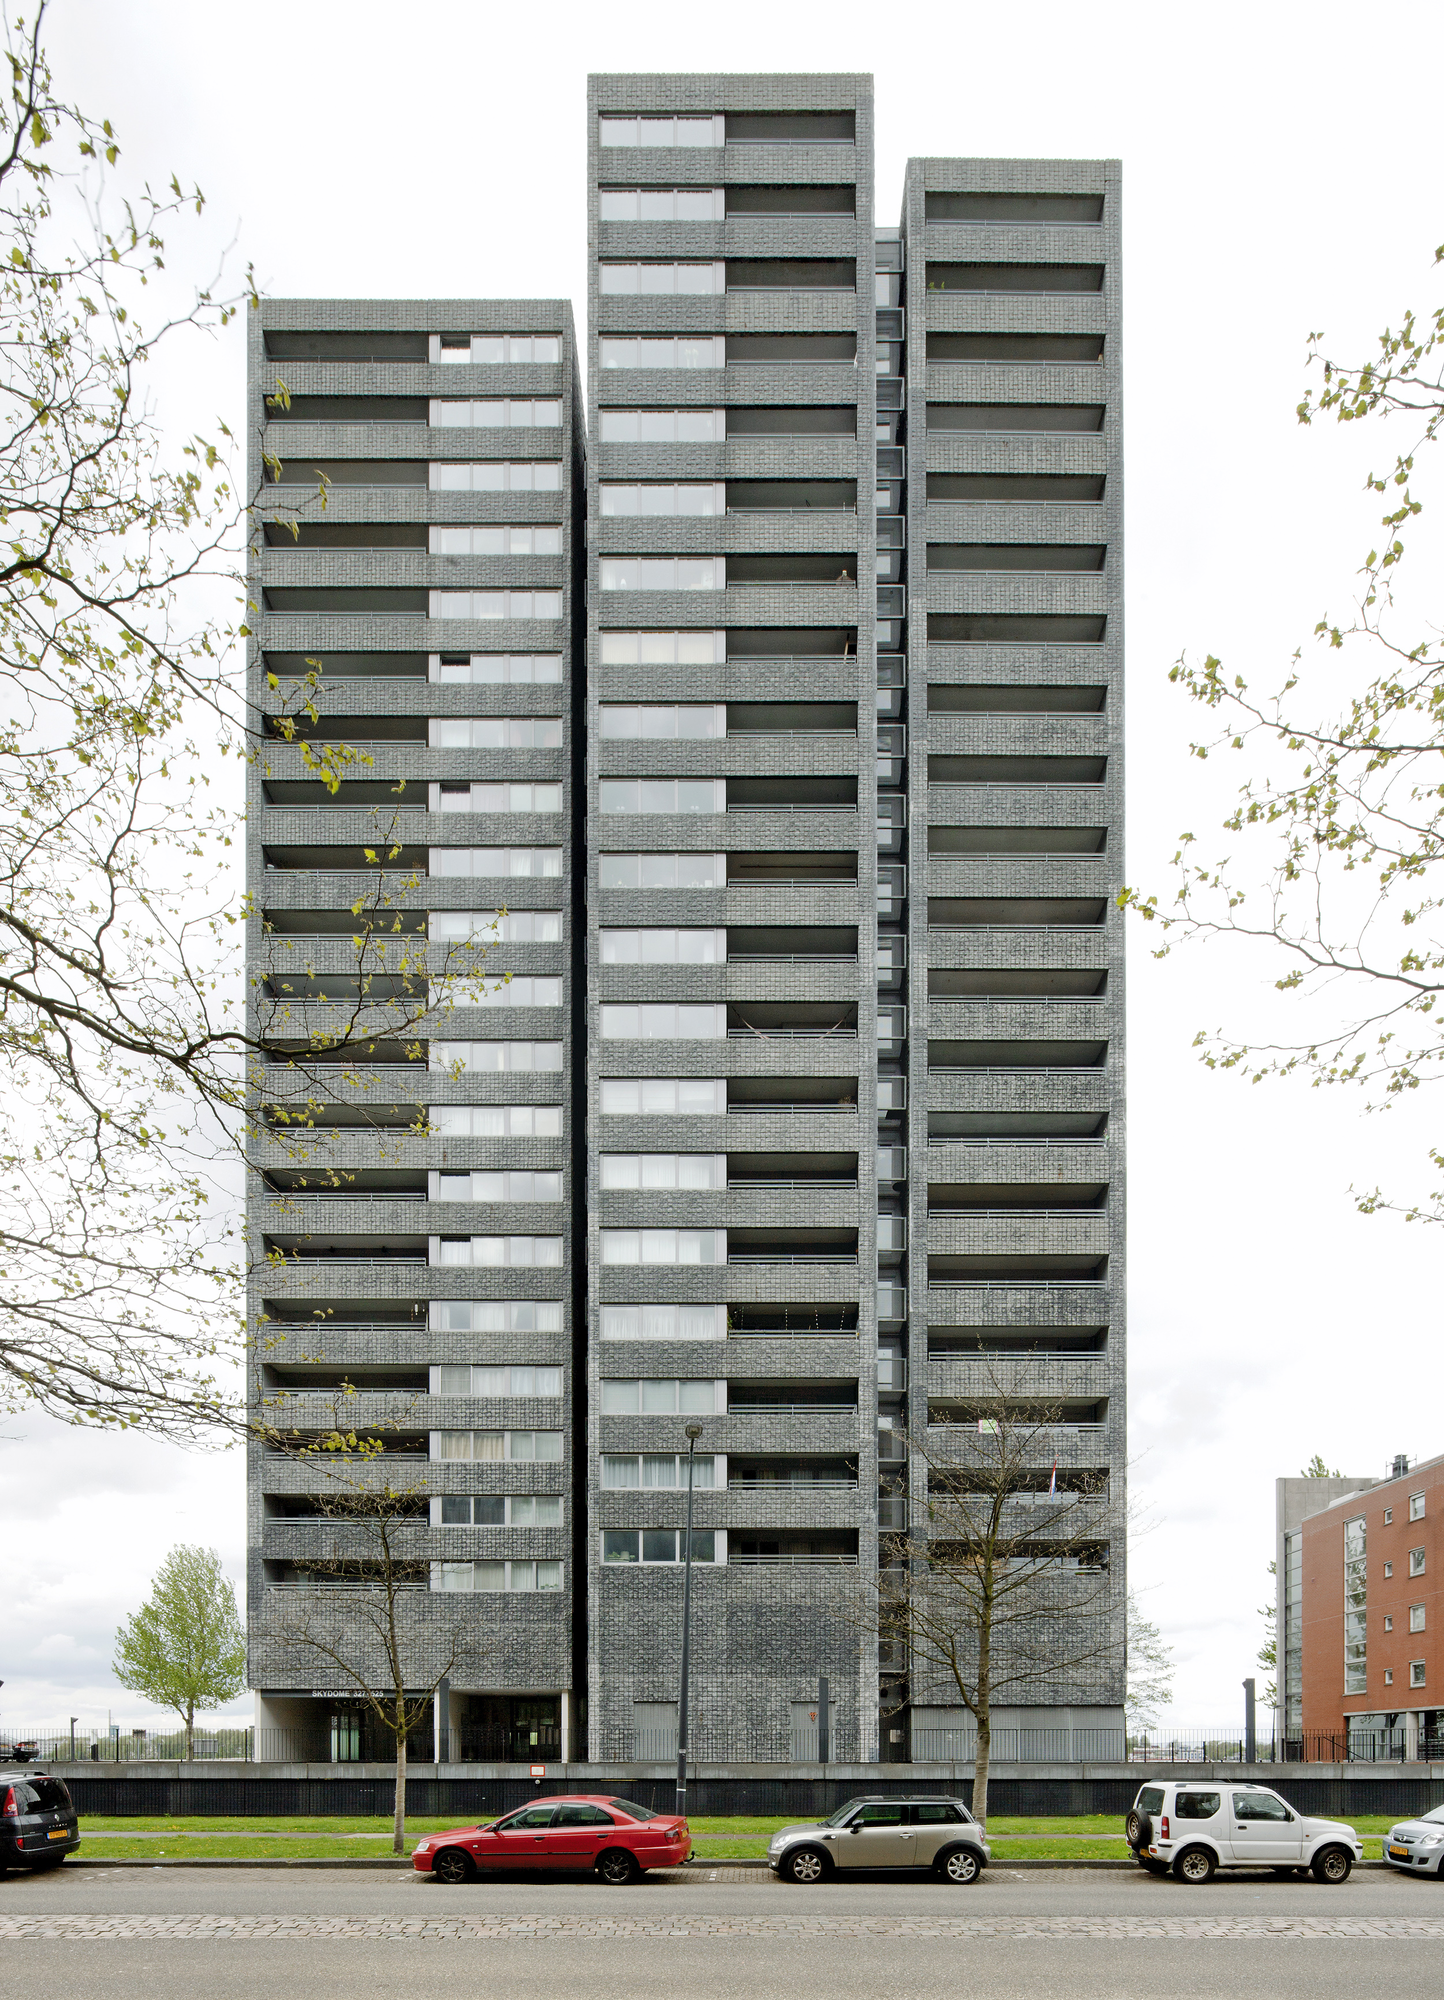 KNSM Island Skydome / Wiel Arets Architects, © Jan Bitter